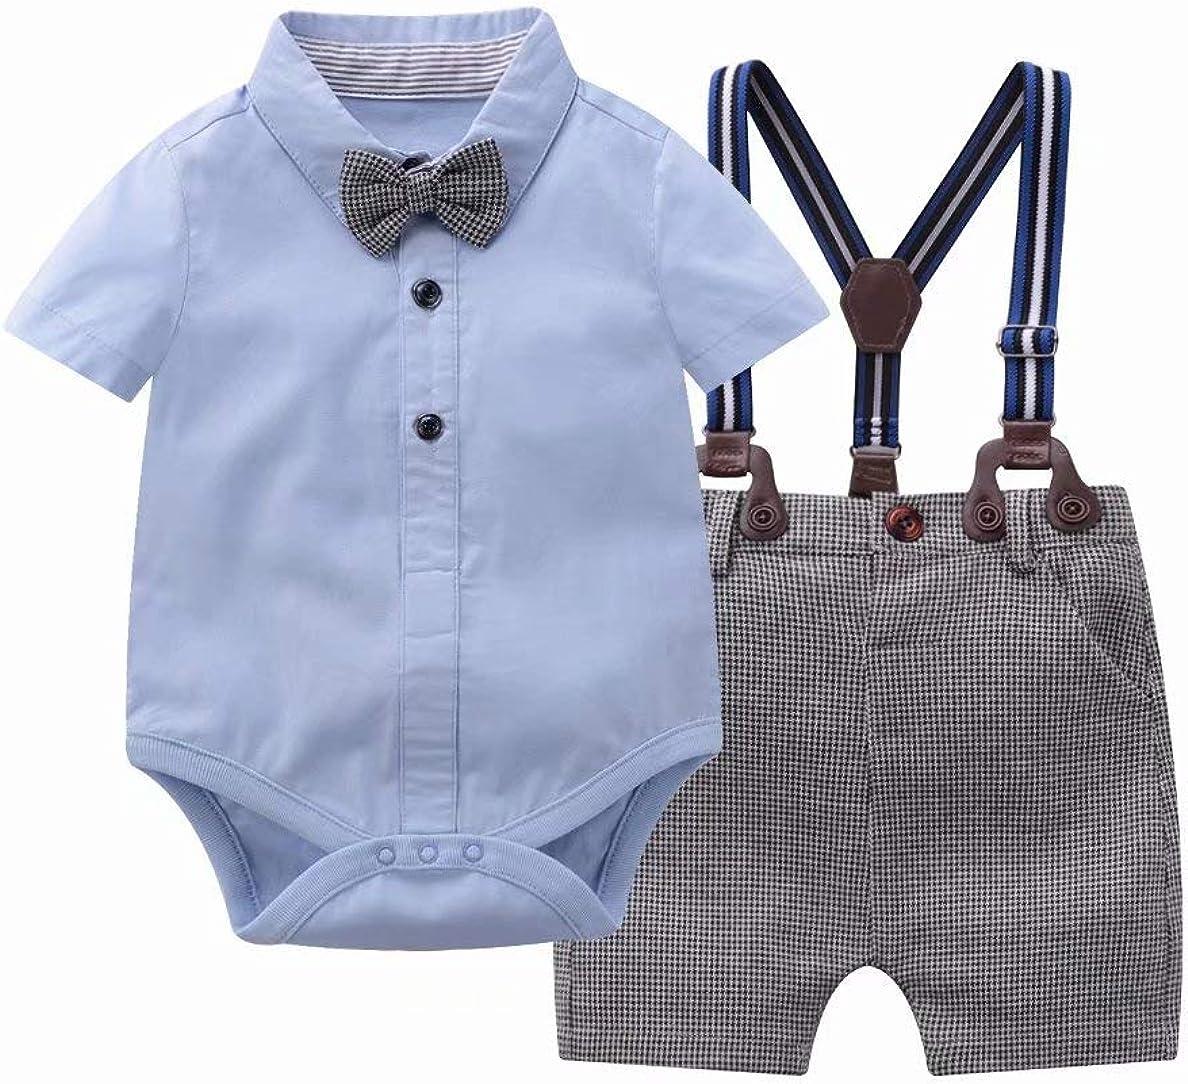 Tiepant Gentleman Outfits Suits Infant Bodysuit Clothing Set